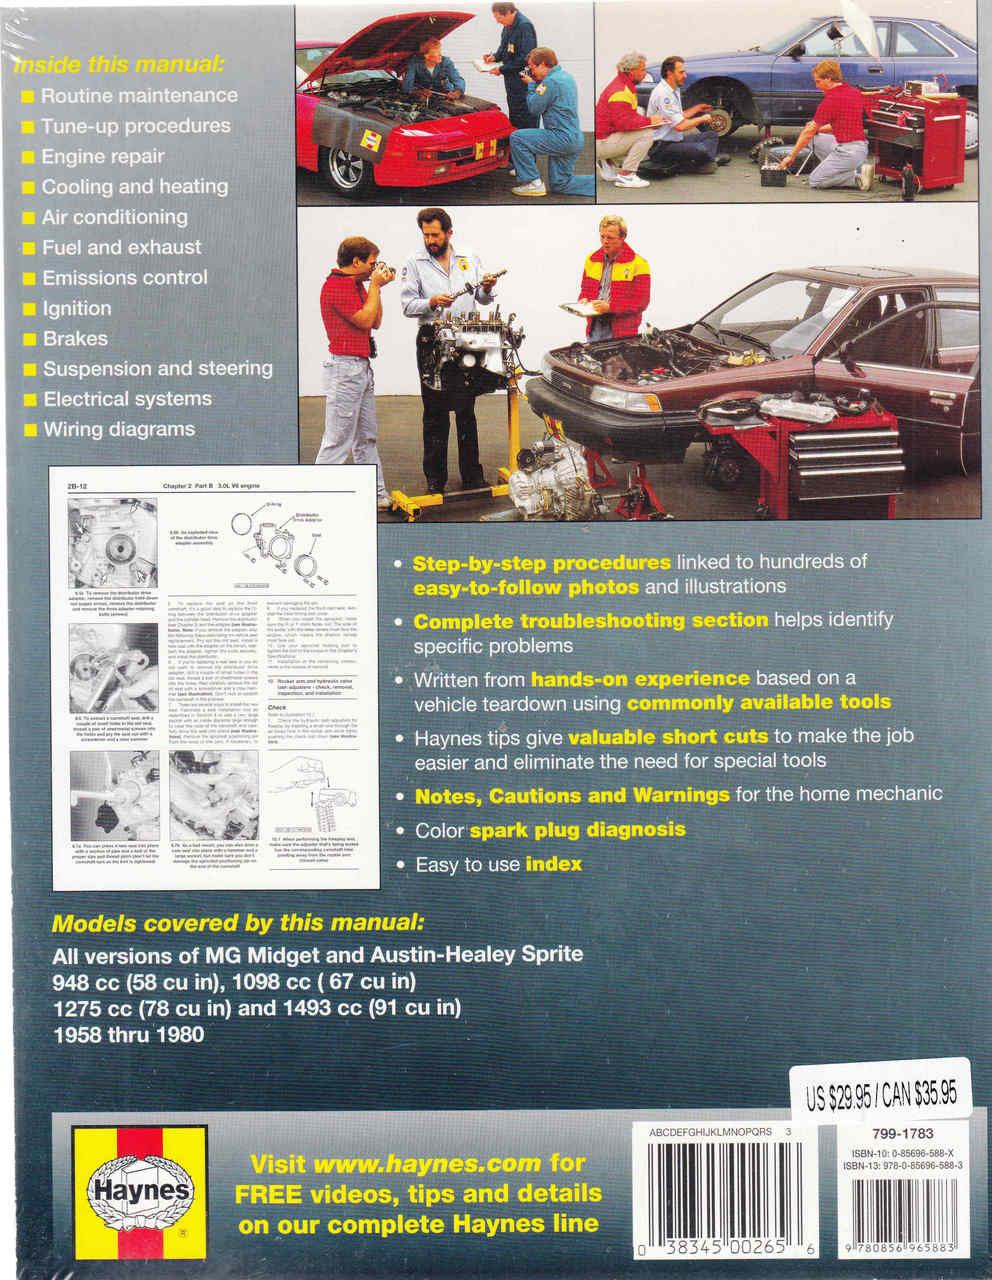 medium resolution of  mg midget amp austin healey sprite 1958 1980 workshop manual